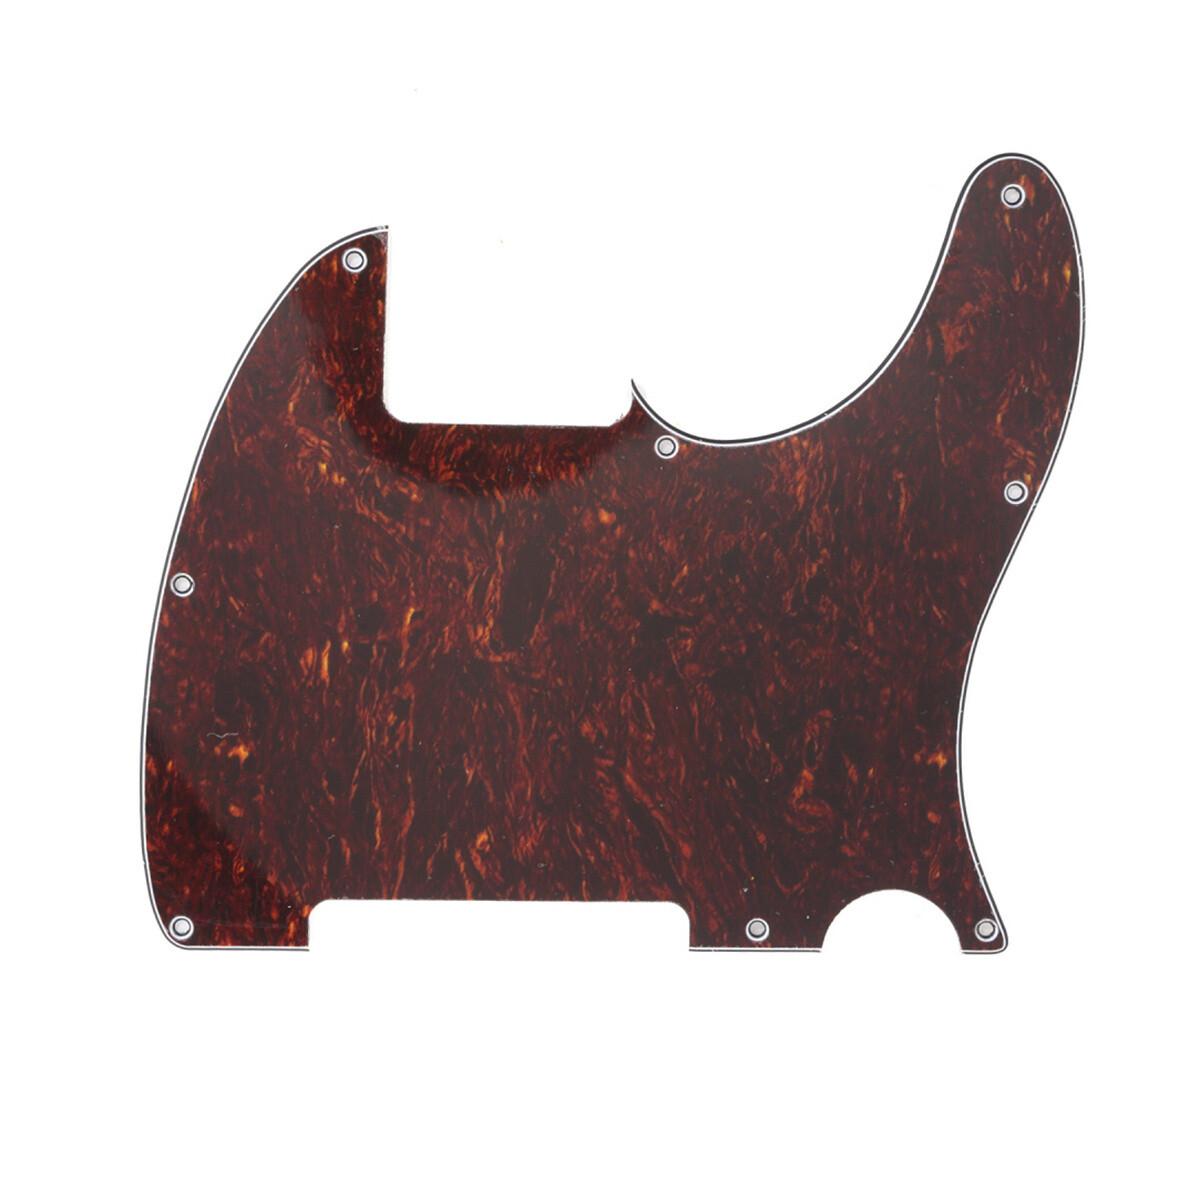 Carparelli Vintage Esquire 8 Hole Tele® Pickguard RH 4 Ply Red Tortoise